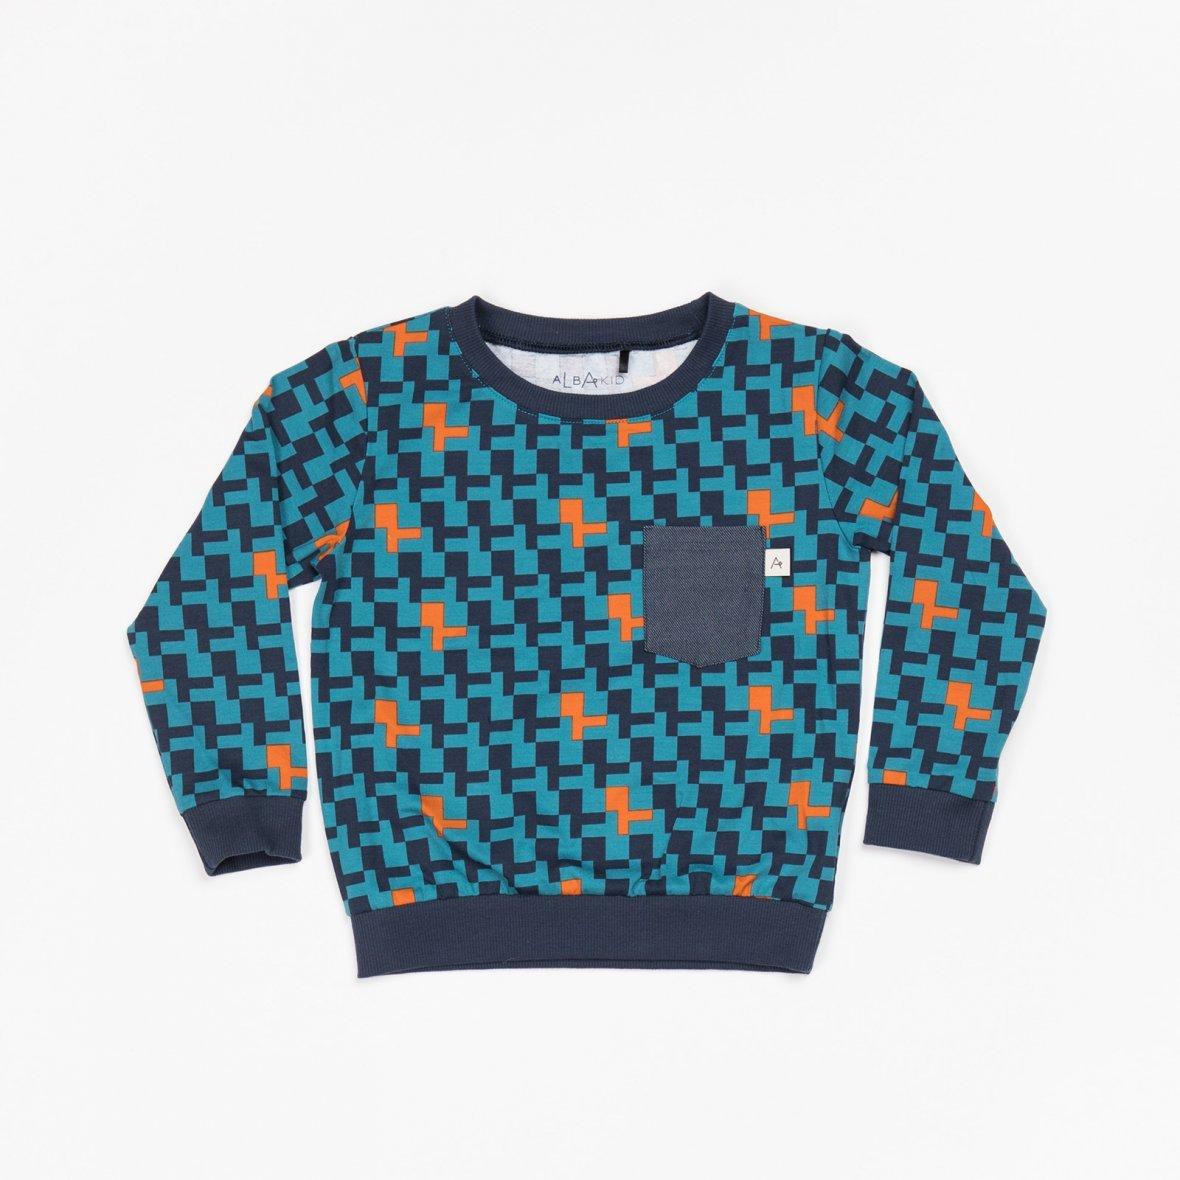 Jais Shirt by Alba of Denmark